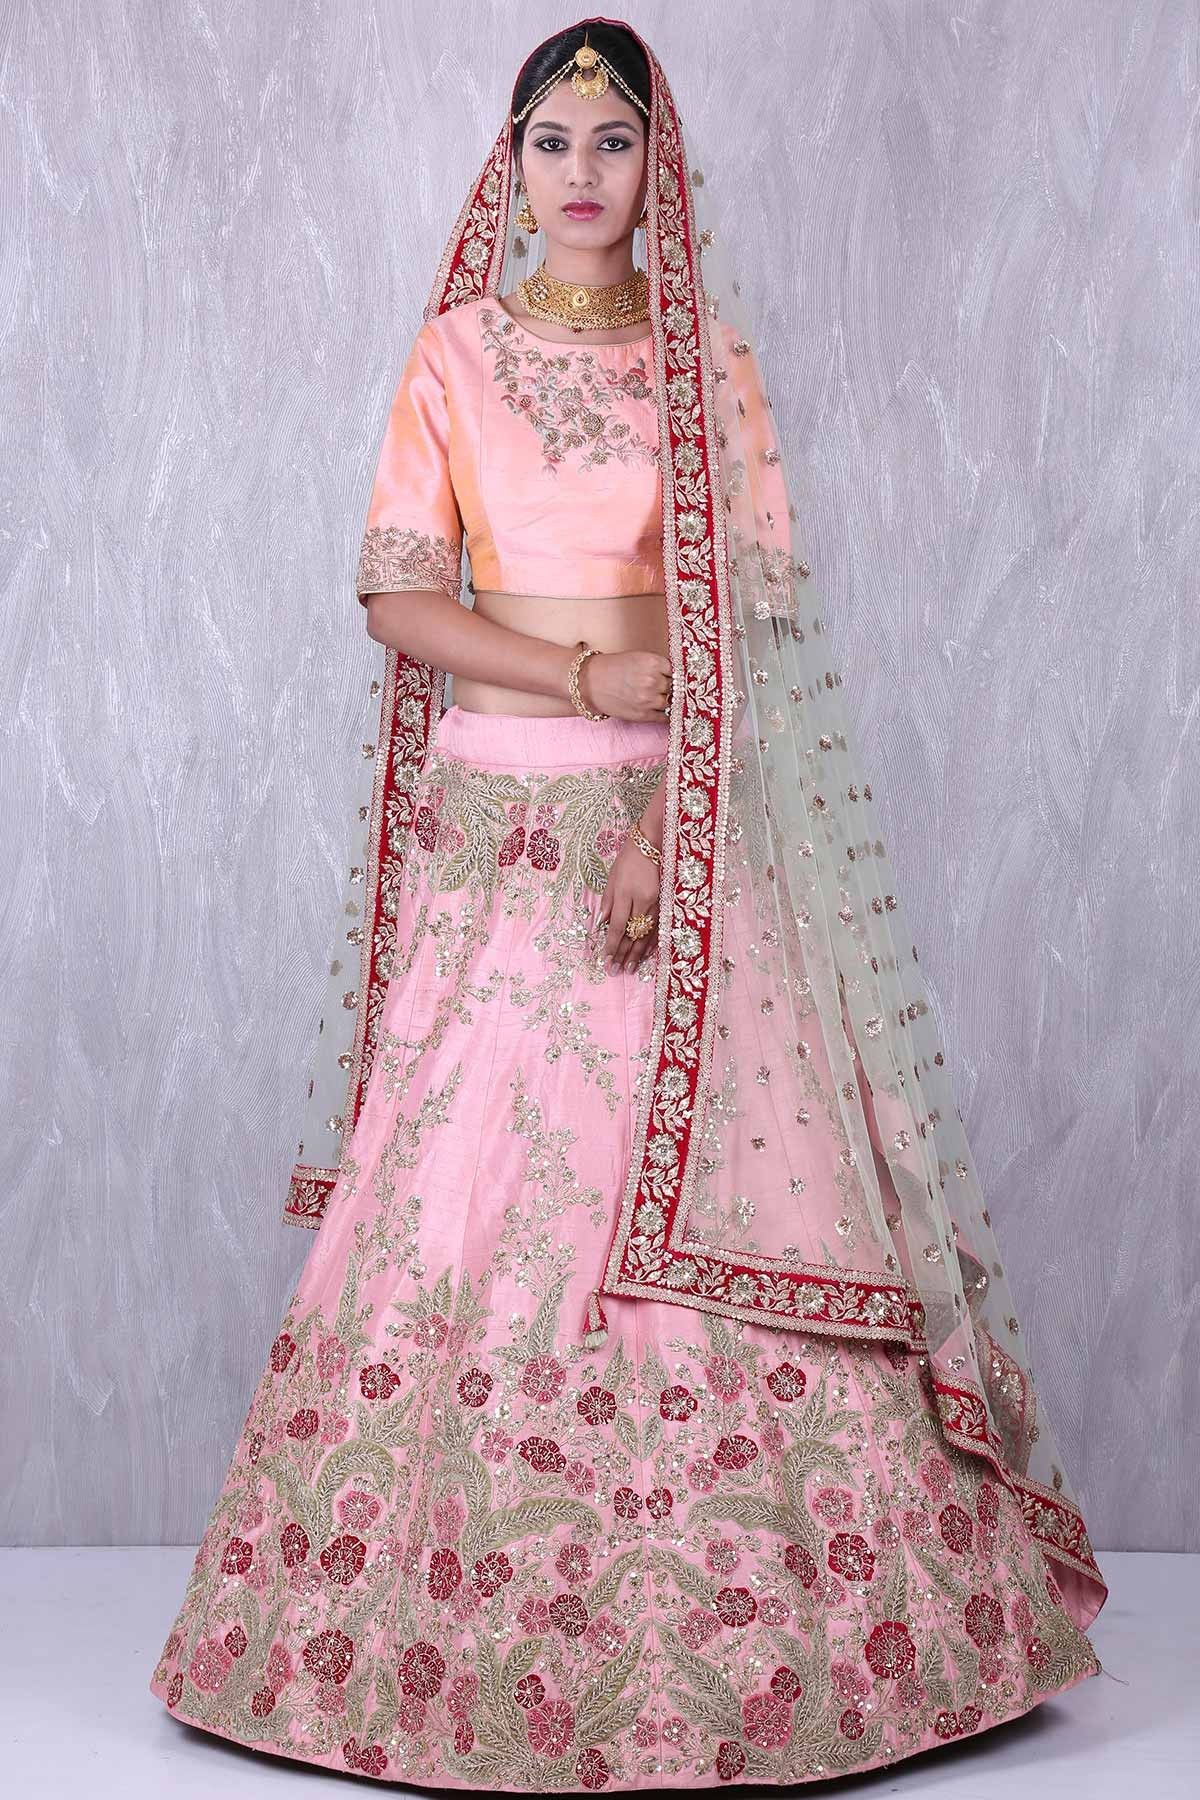 b2d4aa2b63 Buy Baby pink & peach pink gorgeous raw silk lehenga choli with zardosi  work Online #lehenga #bridal #circular #indowestern #rawsilk #embroidered  #zardosi ...